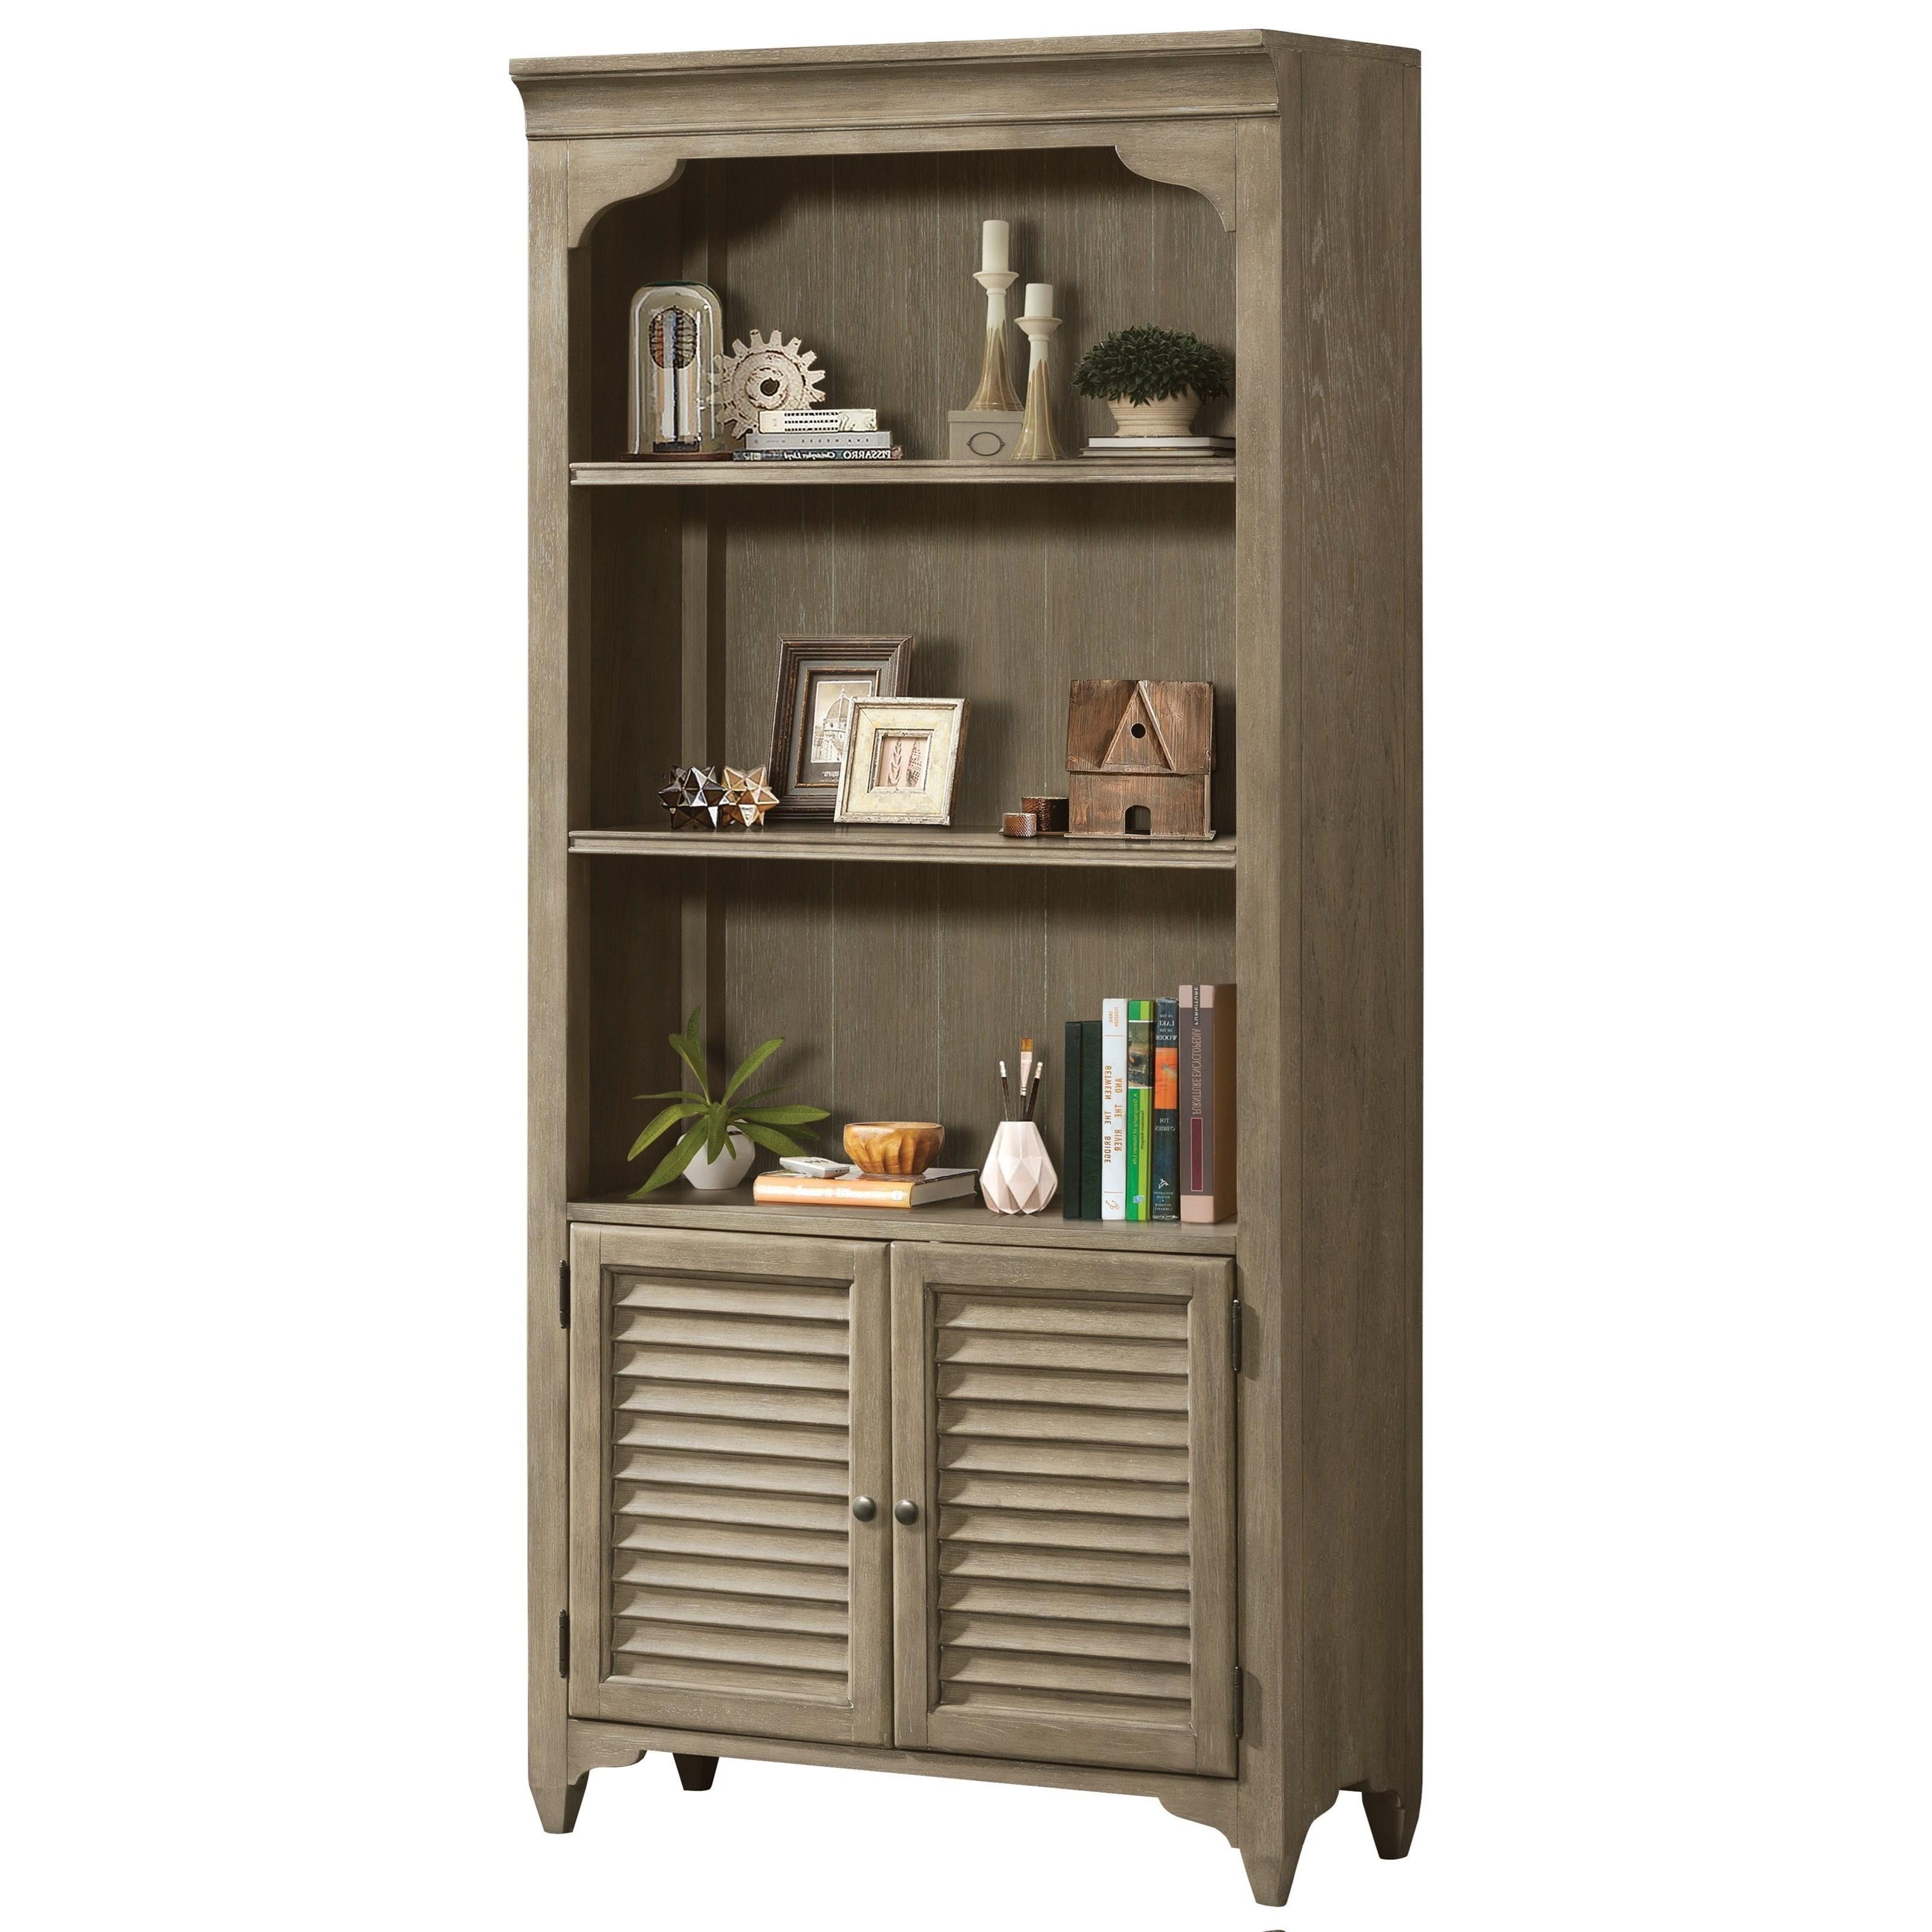 Myra Bunching Bookcase by Riverside Furniture at Mueller Furniture